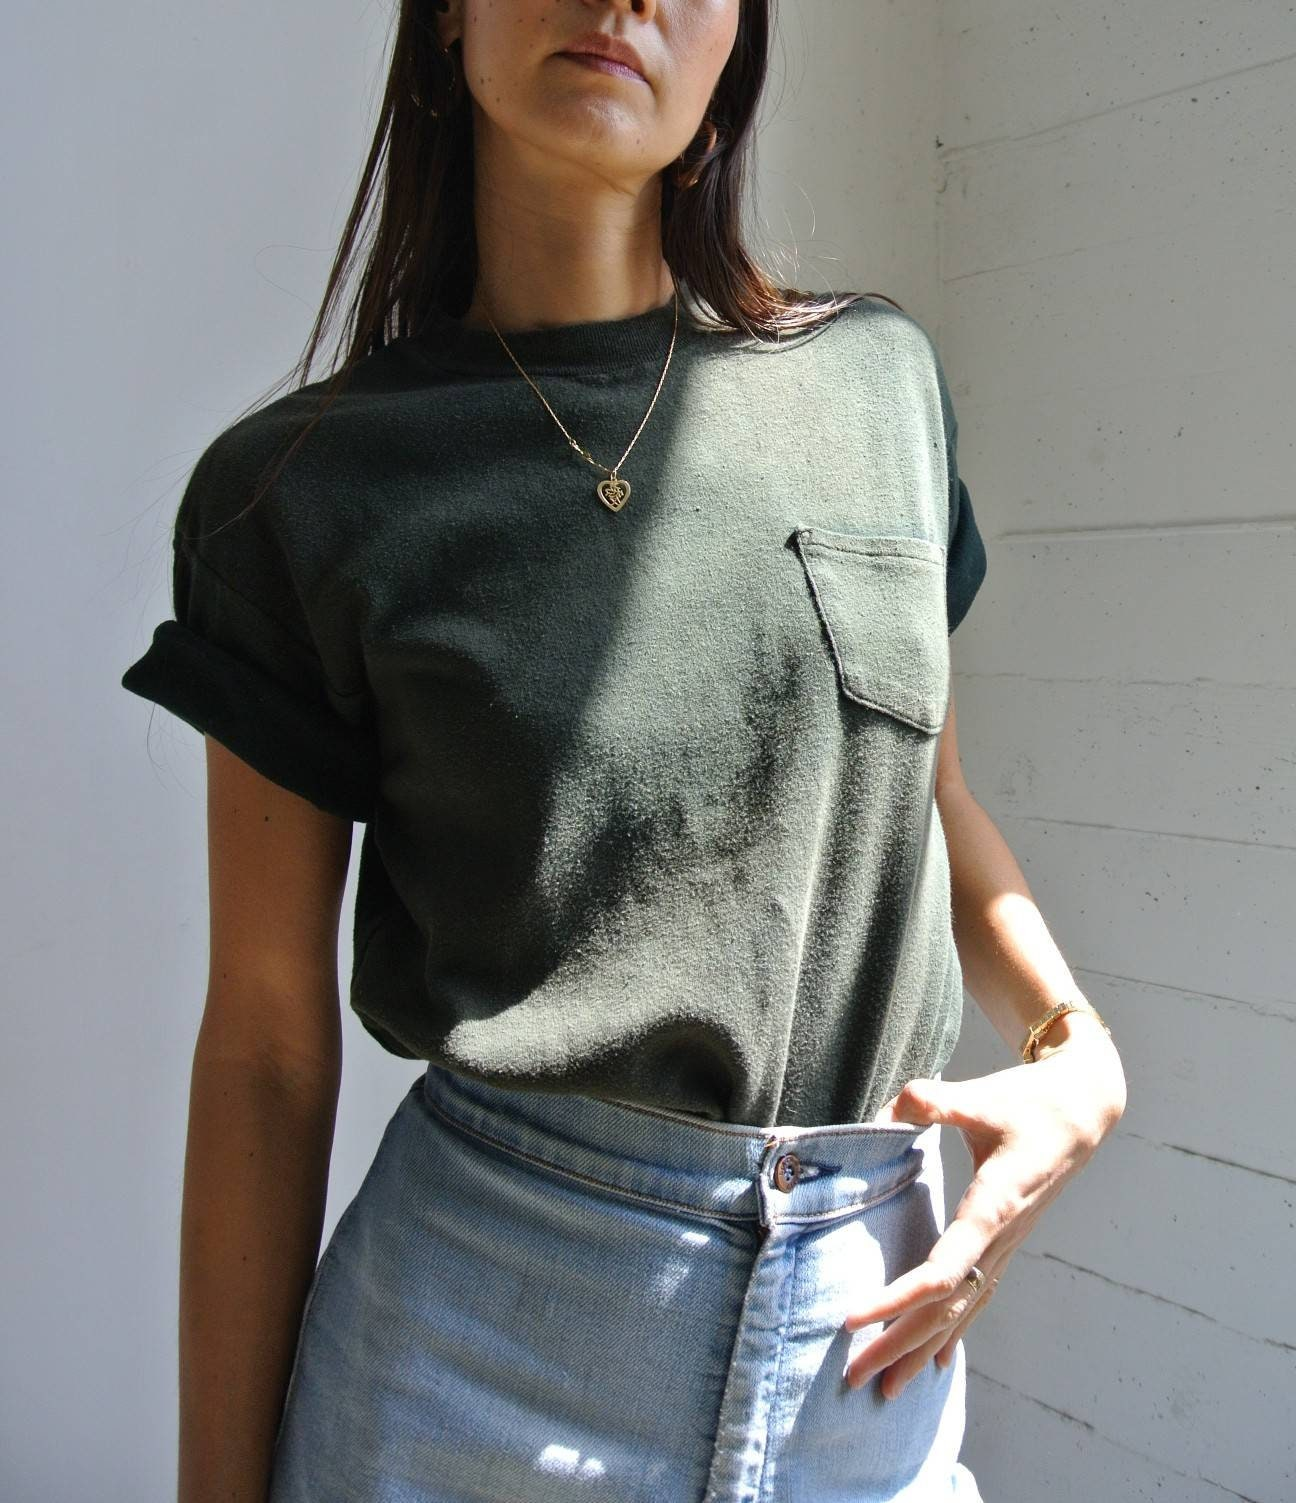 1970s Mens Shirt Styles – Vintage 70s Shirts for Guys Vintage 1970S 100 Cotton Faded Black Pocket T-Shirt $0.00 AT vintagedancer.com